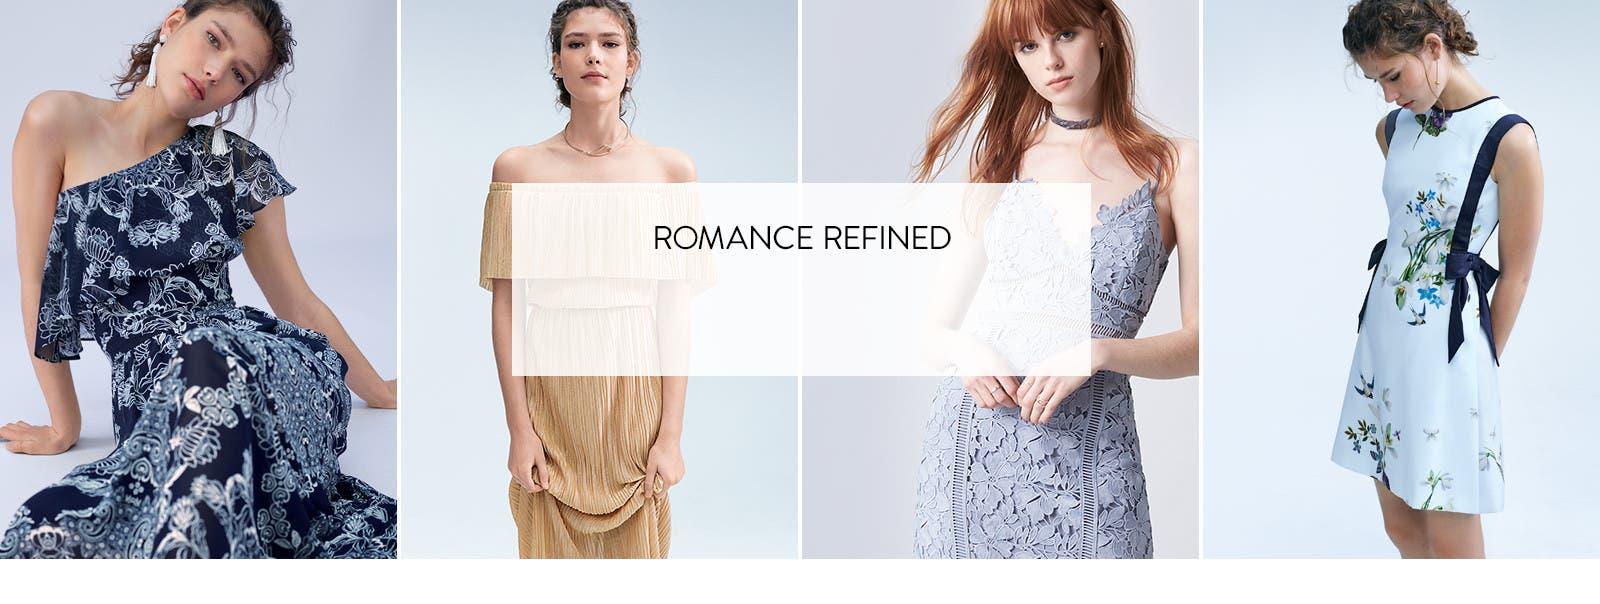 Romance refined: dresses.